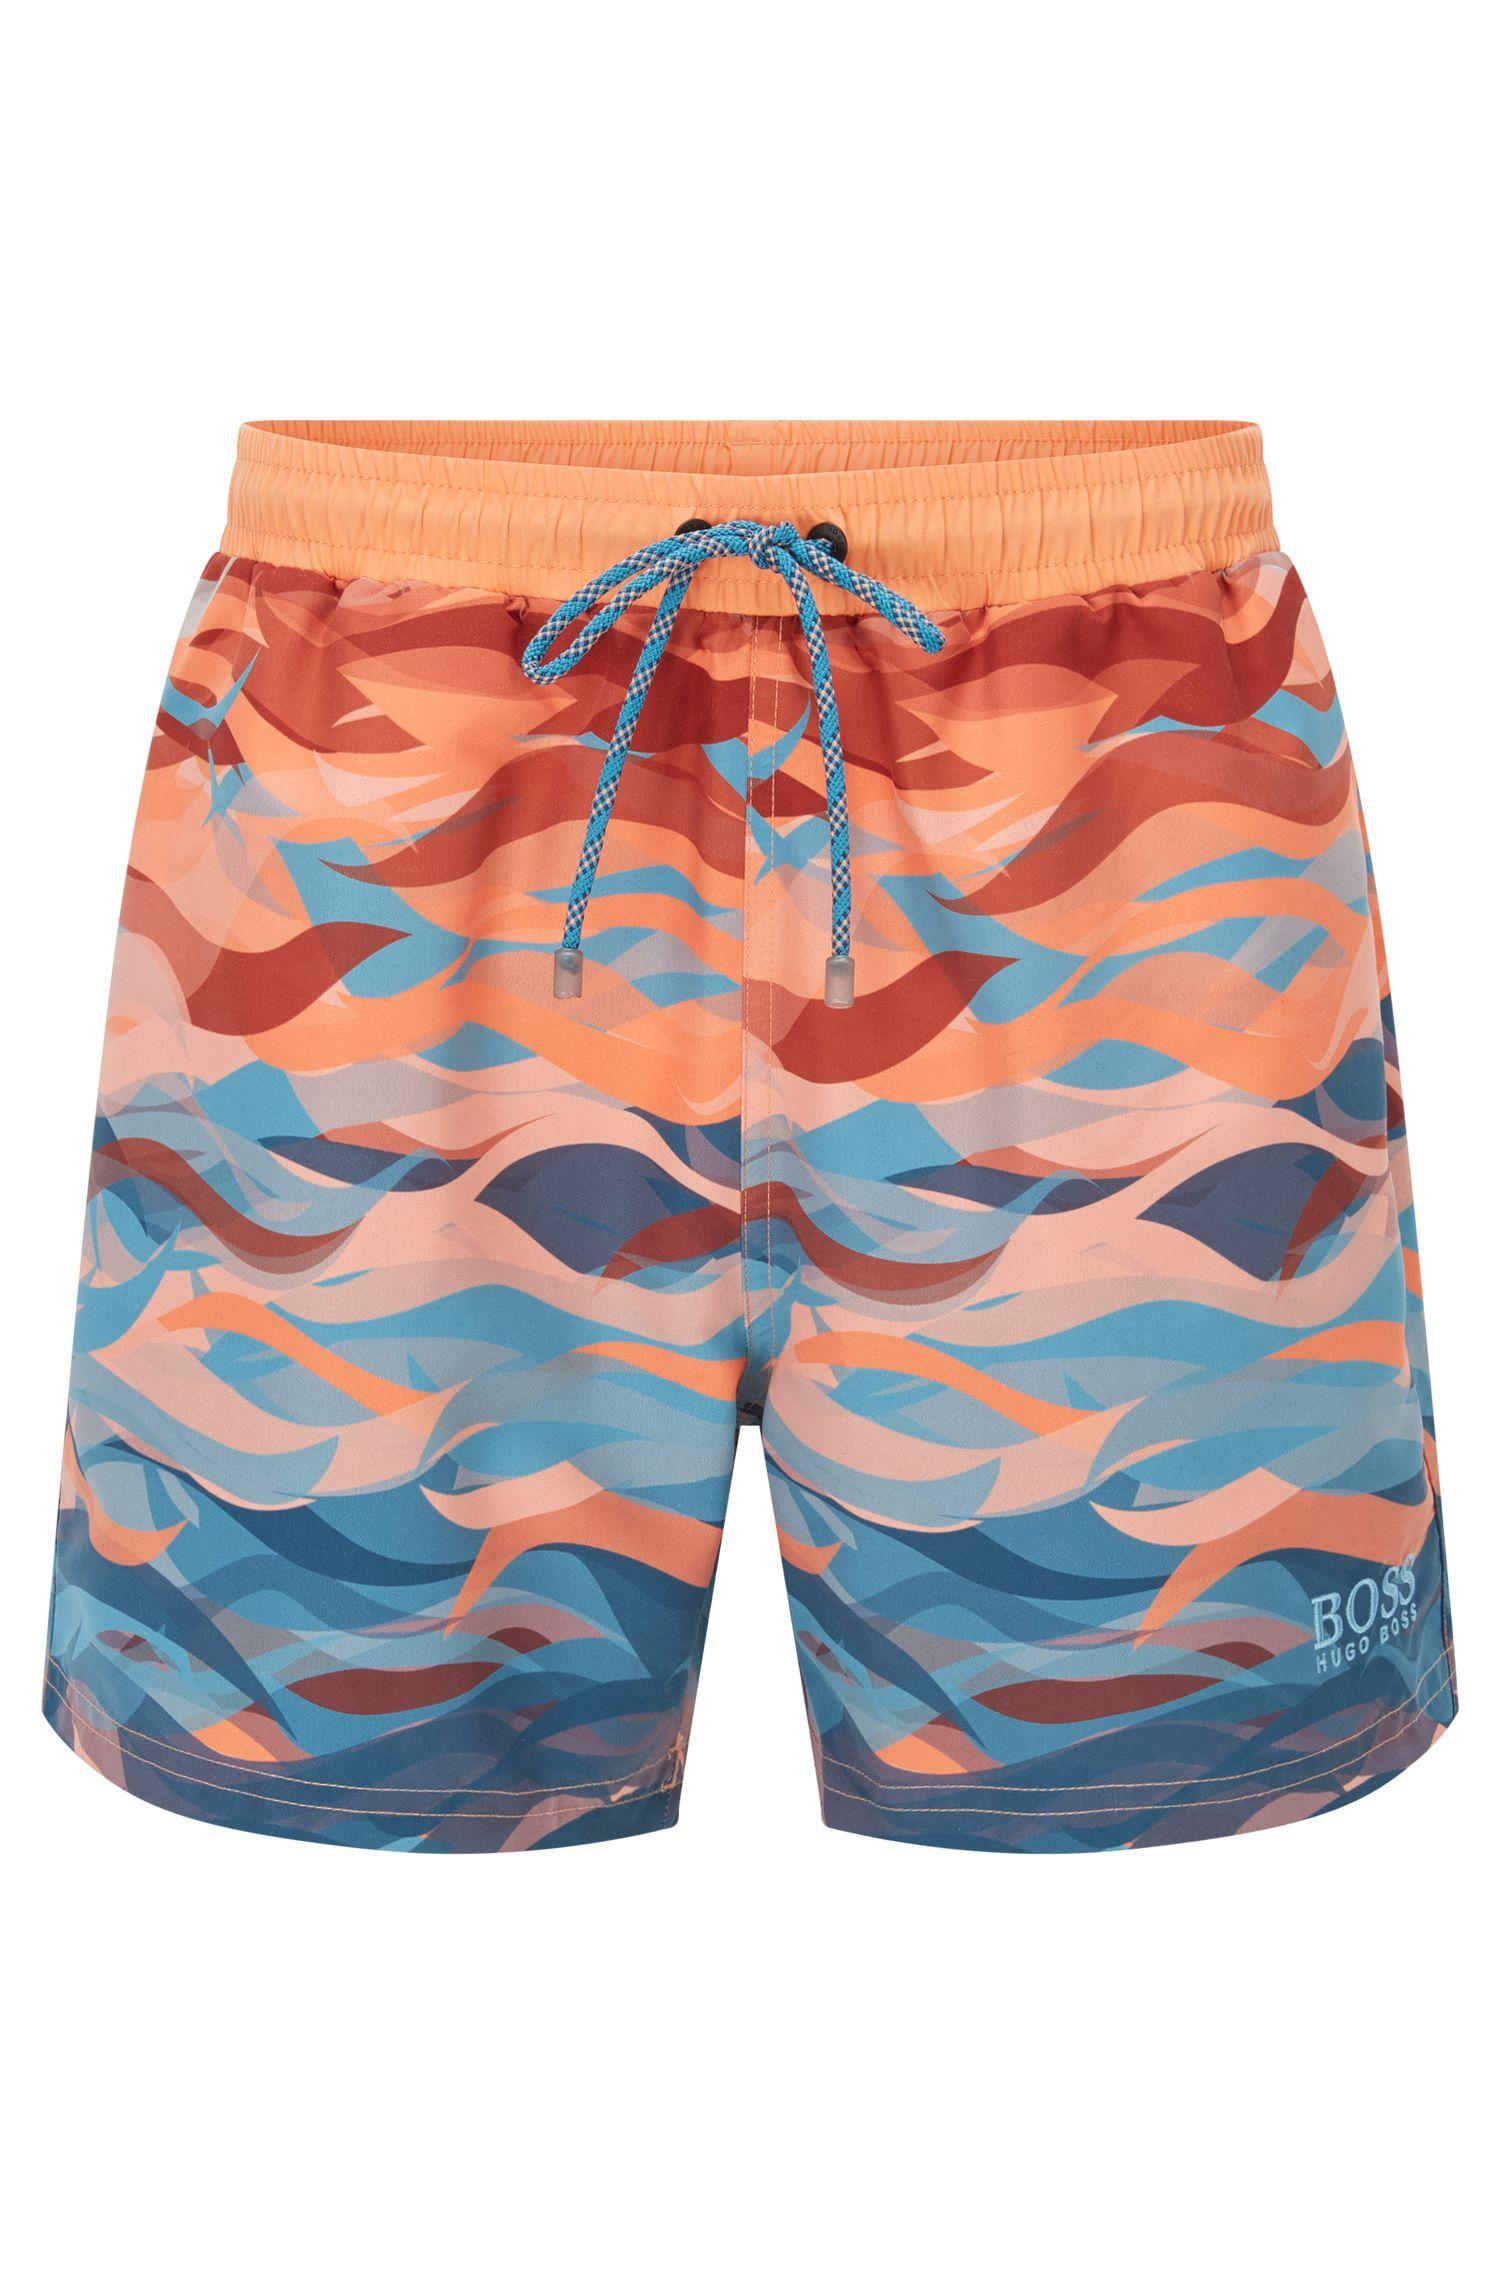 Sneldrogende zwemshort met zigzagdessin: 'Piranha'